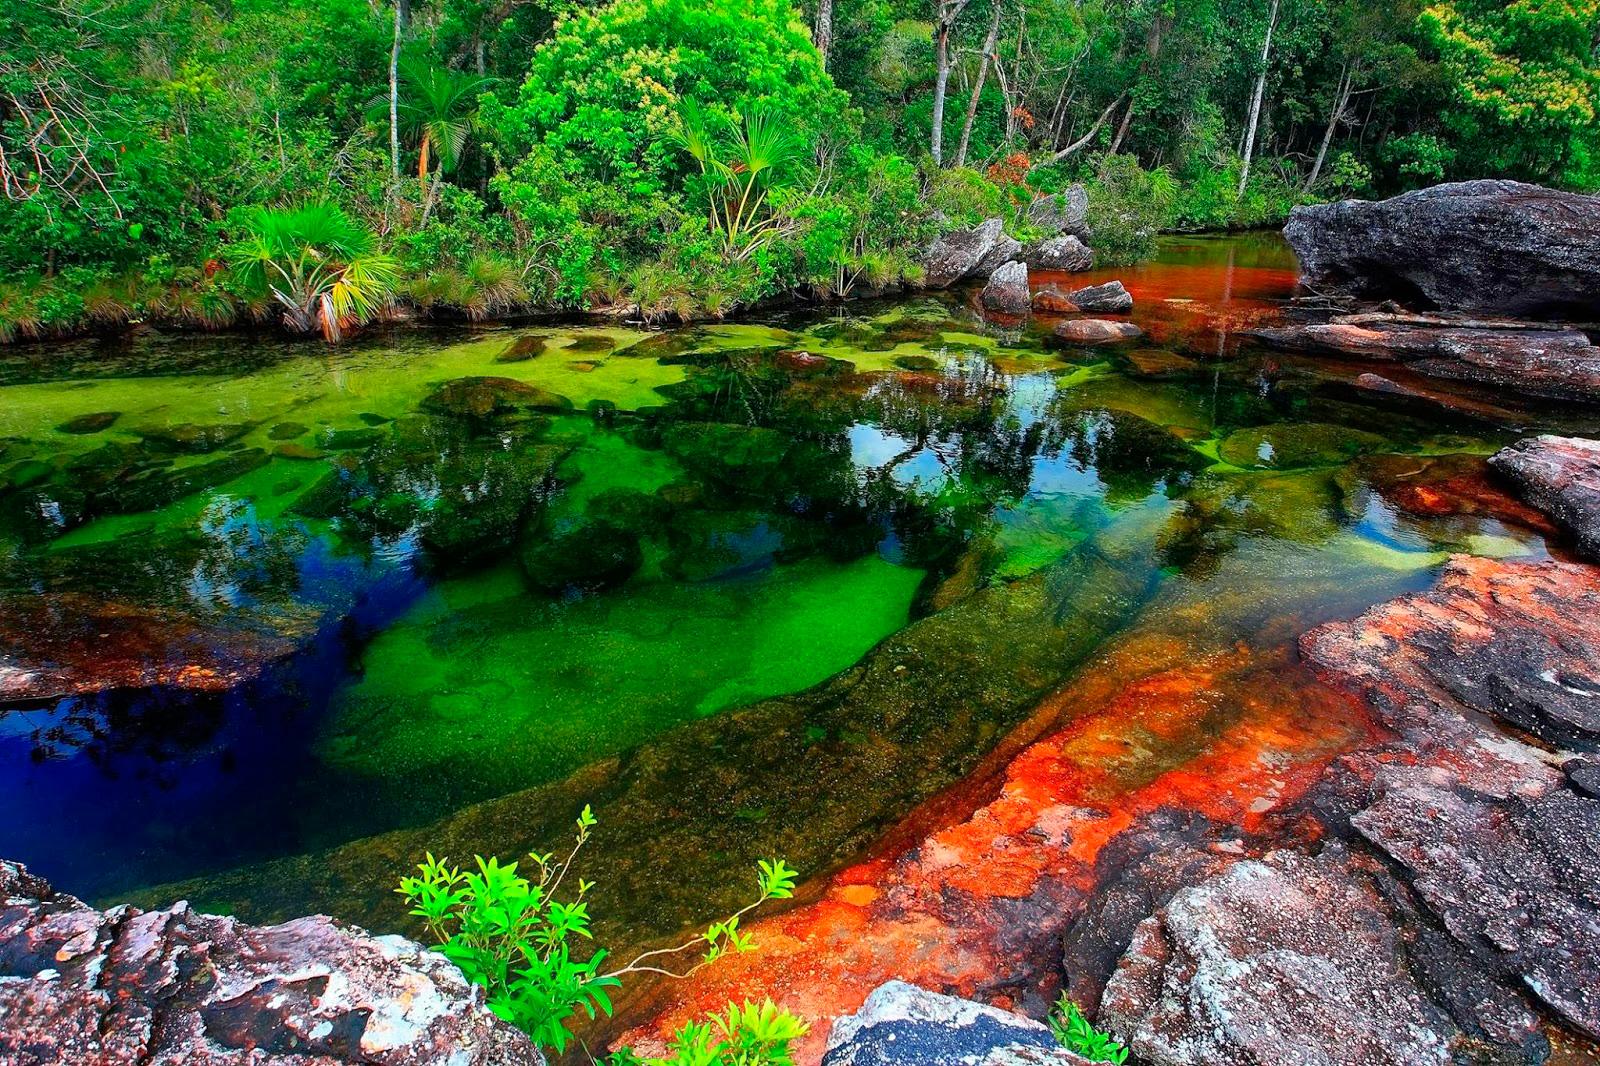 Sông Cano Cristales hóa sắc cầu vồng